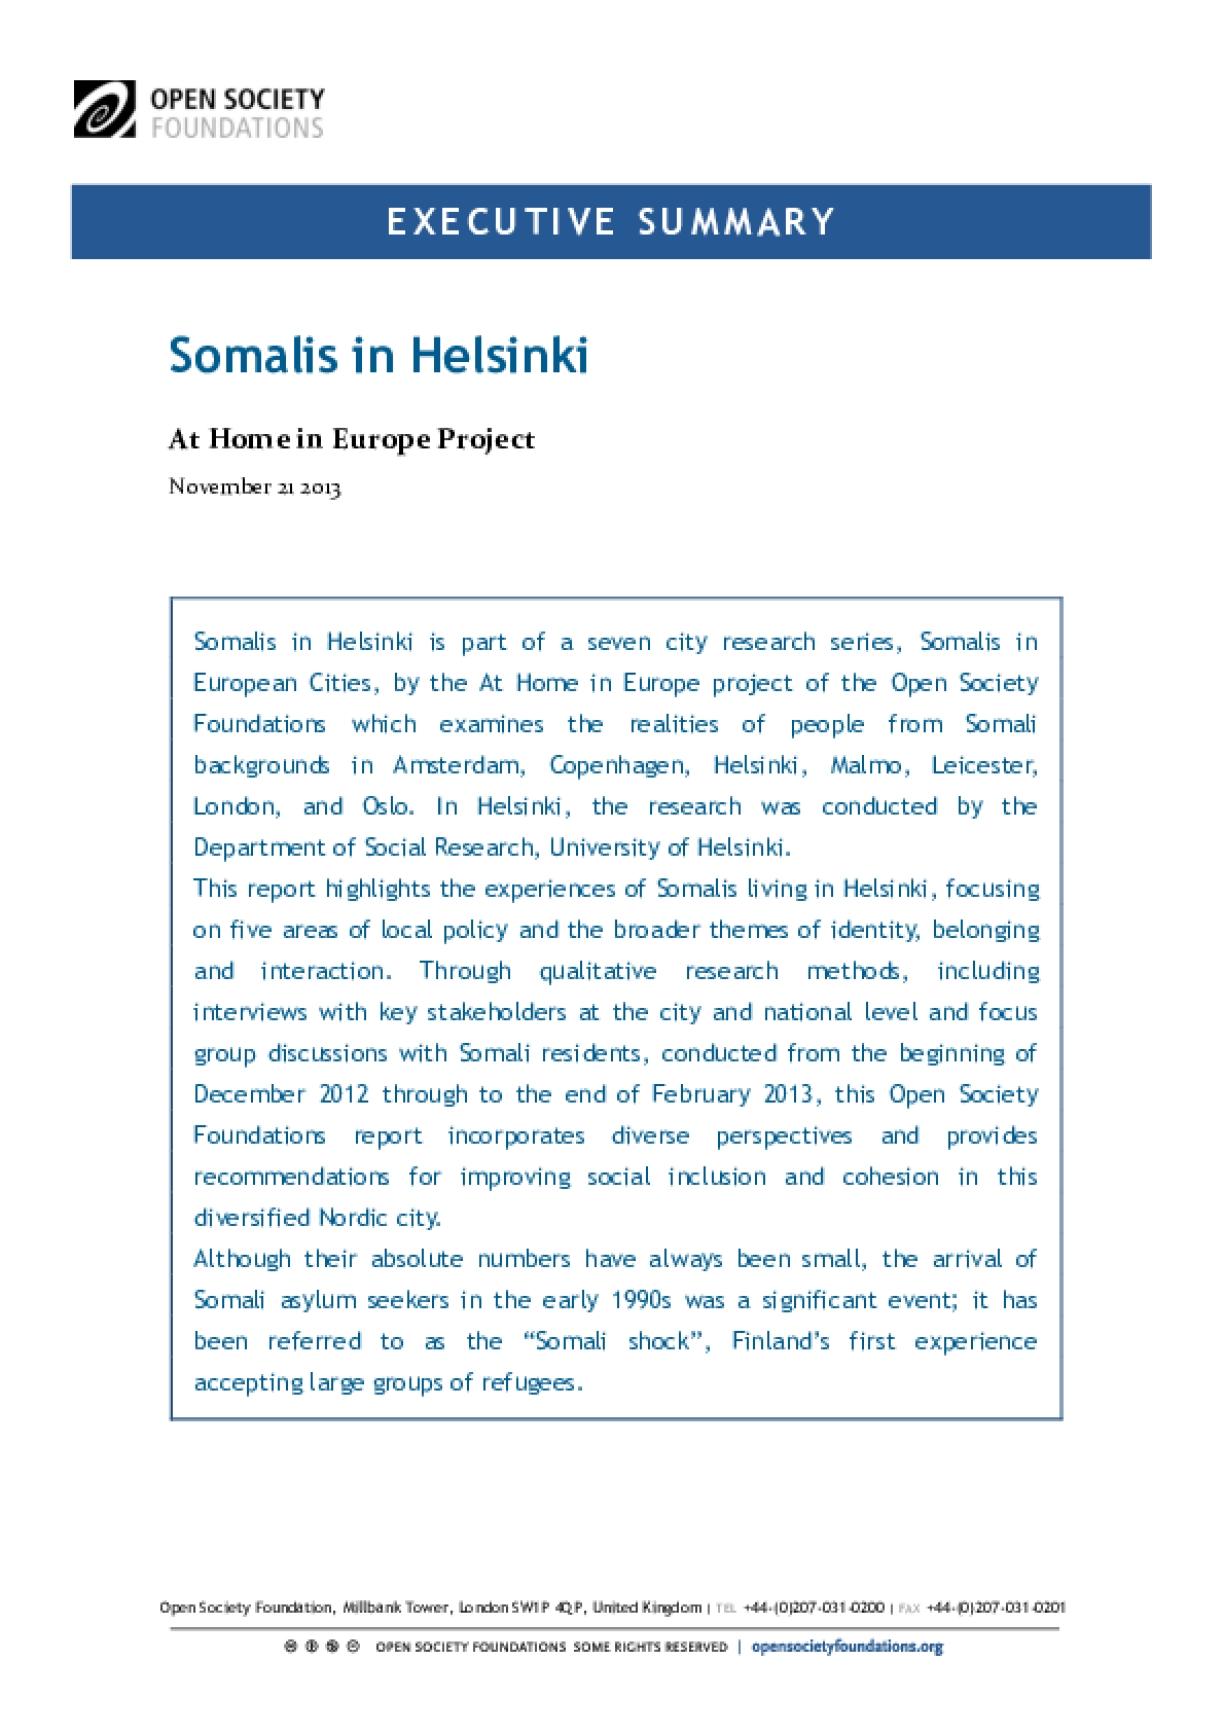 Somalis in Helsinki: Executive Summary